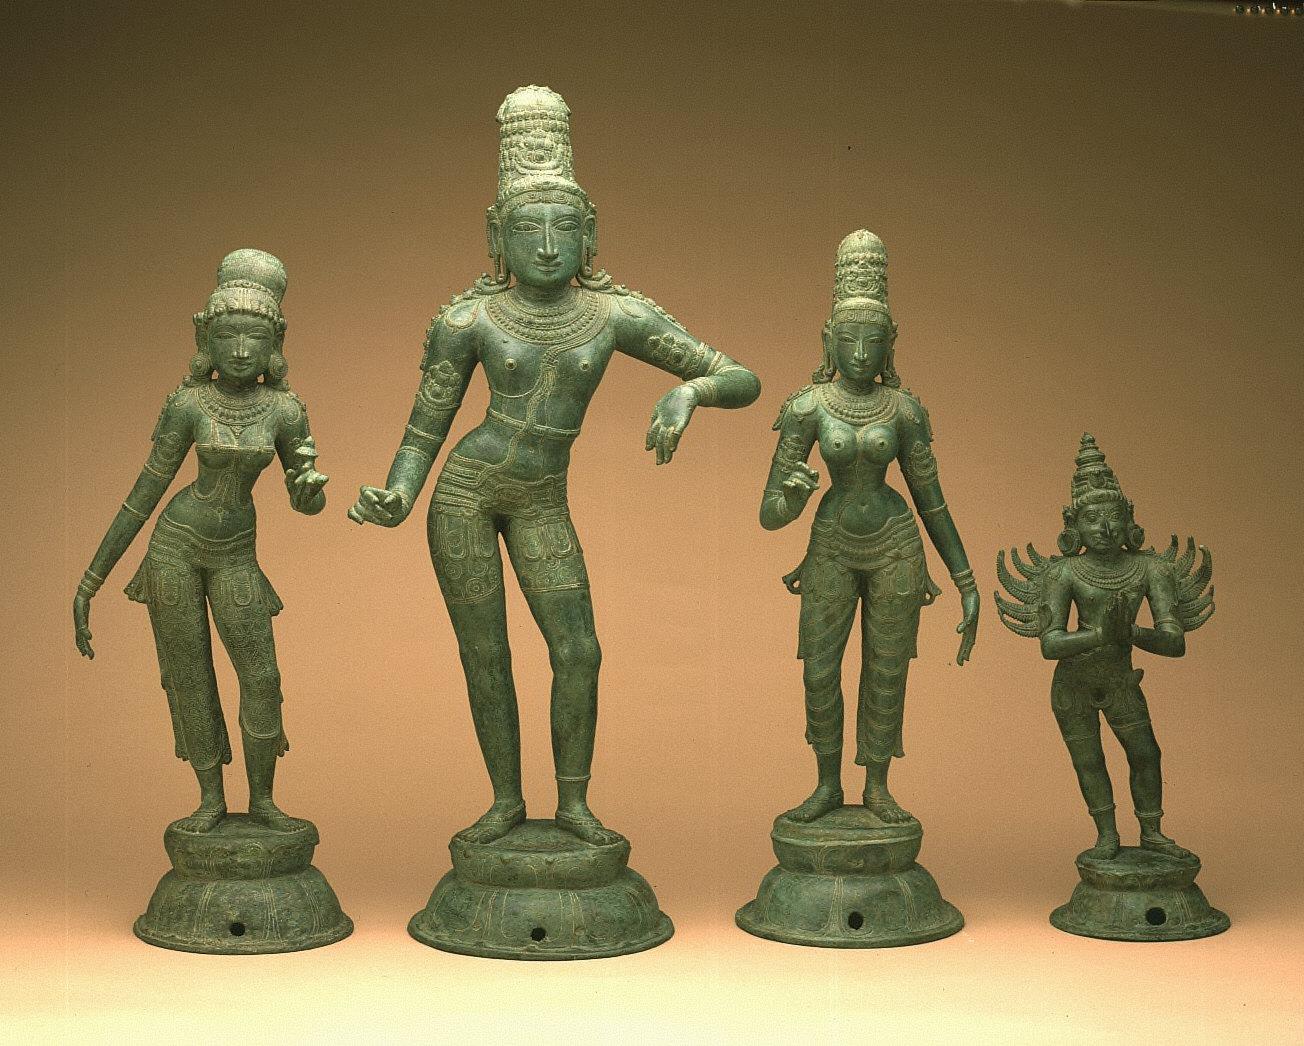 Krishna with His Wives and Garuda